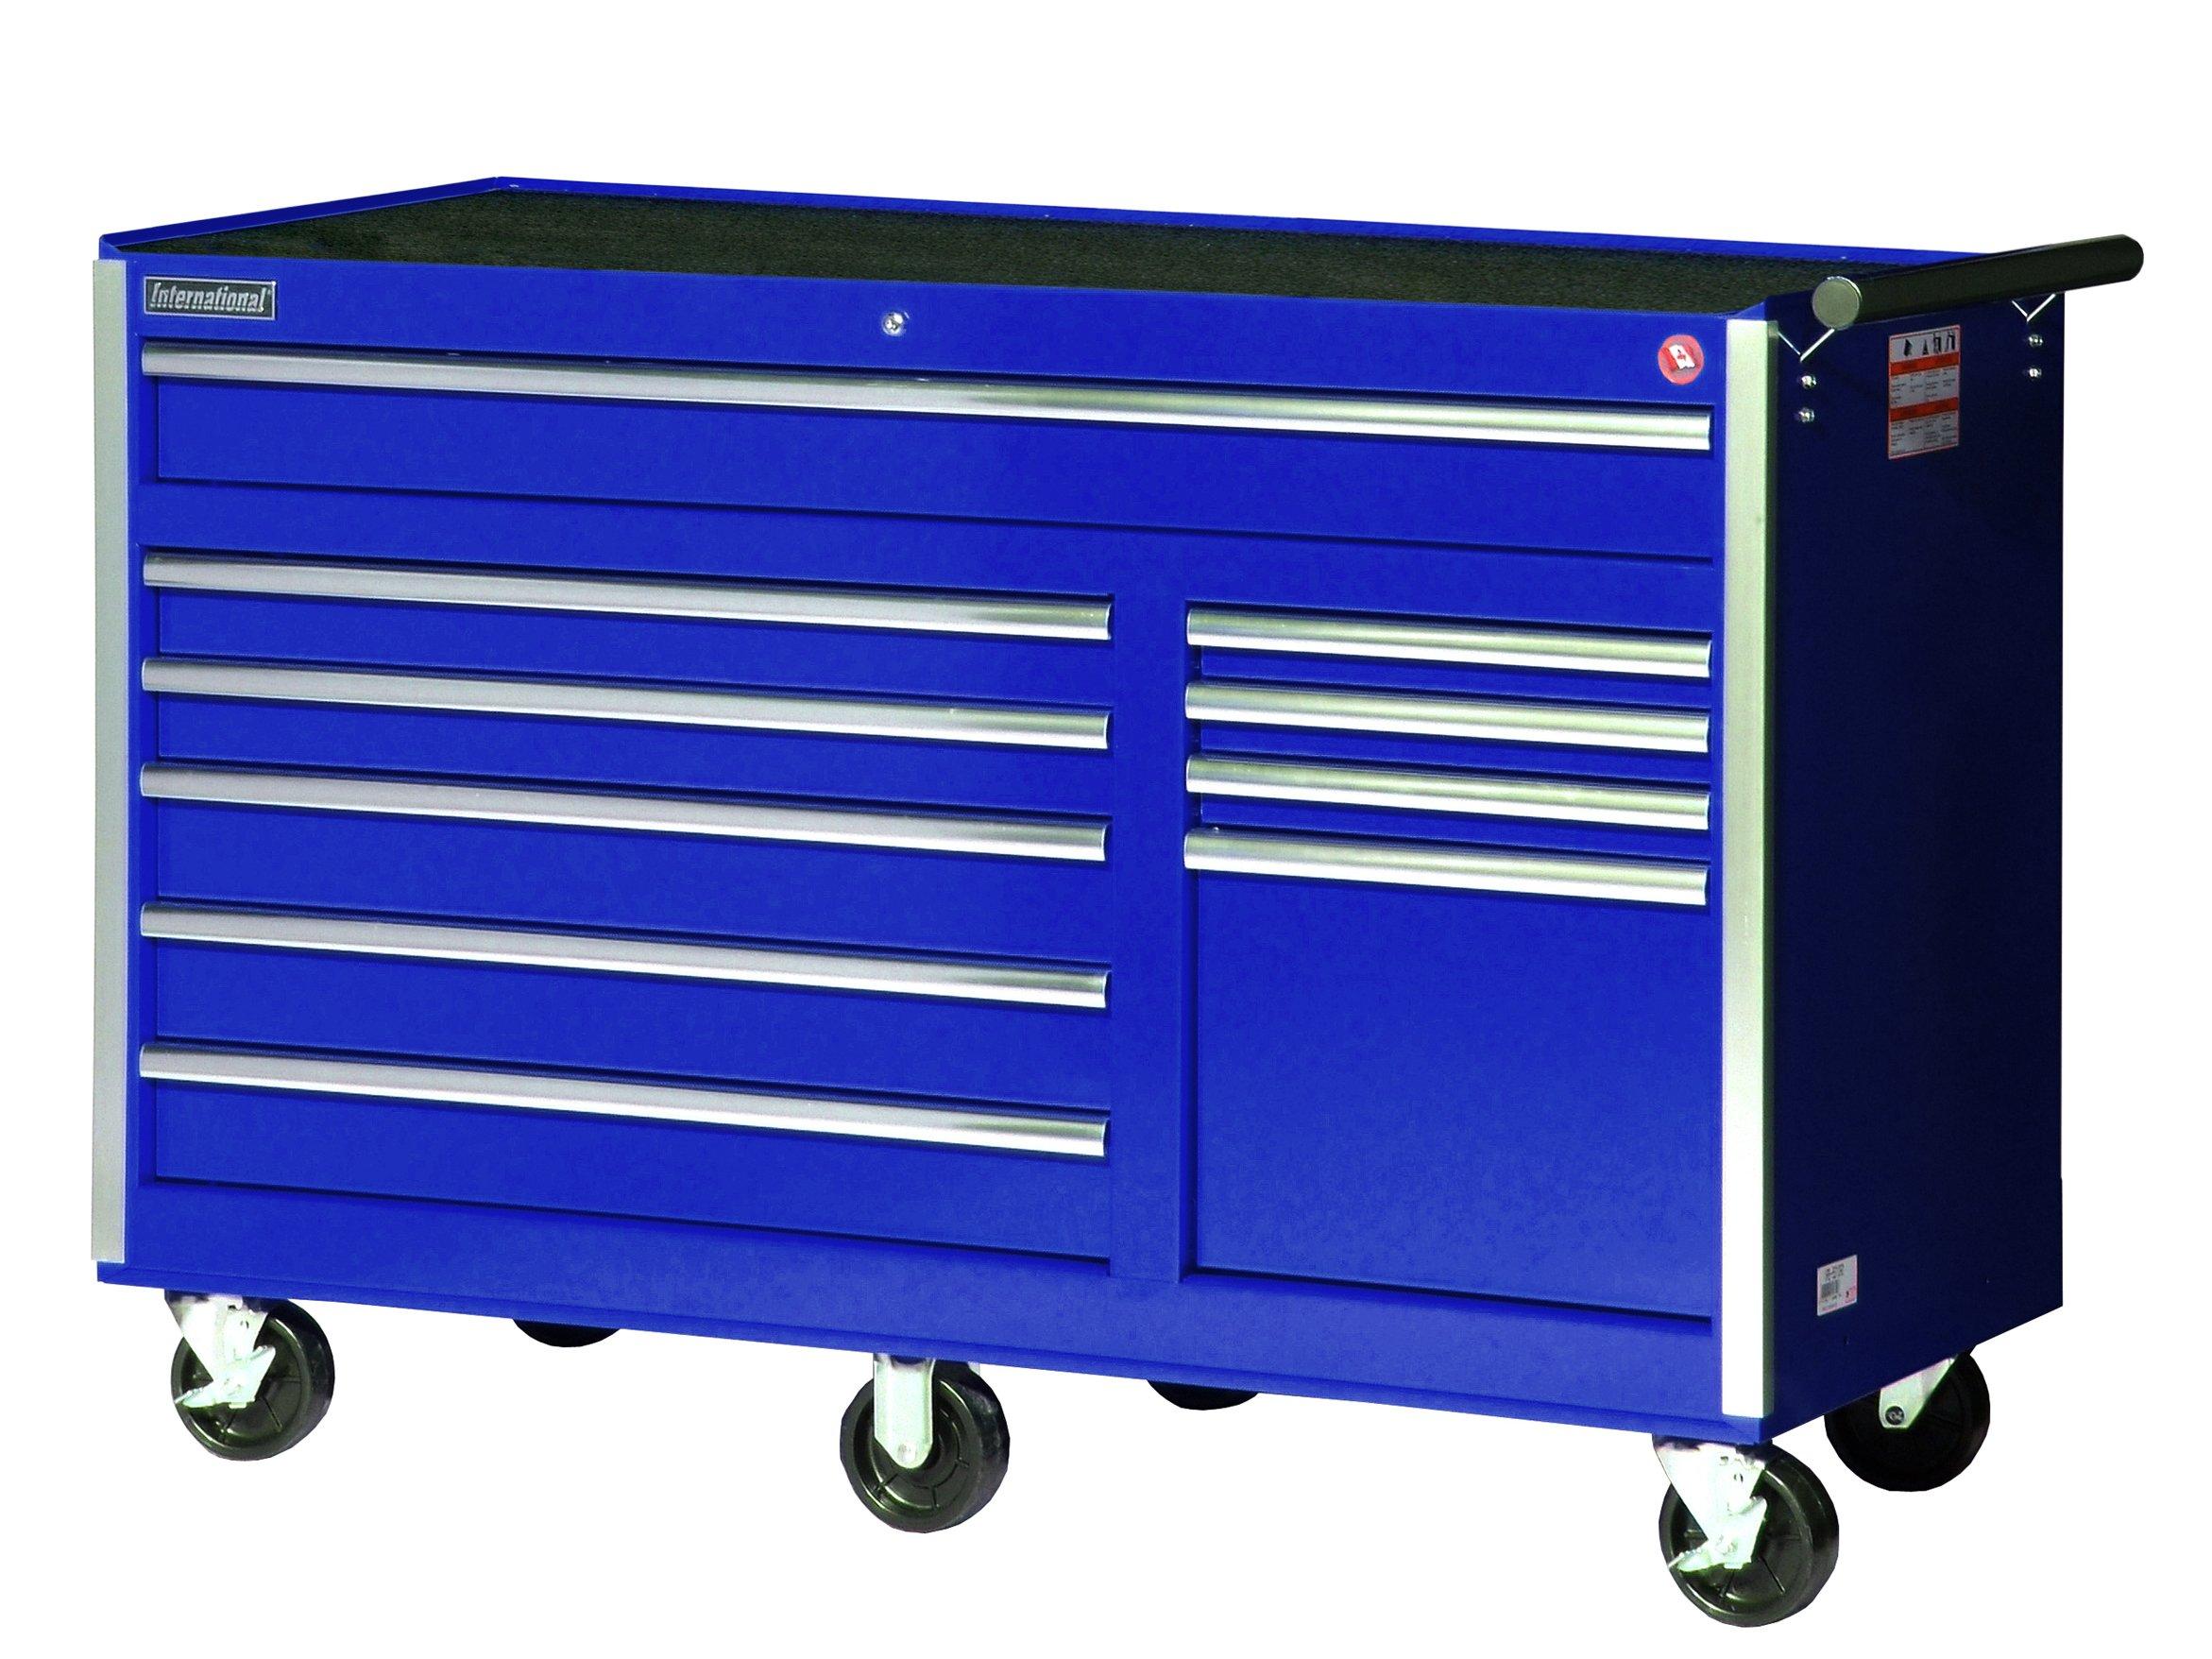 International VRB-5610BU 56-Inch 10 Drawer Blue Tool Cabinet with Heavy Duty Ball Bearing Drawer Slides